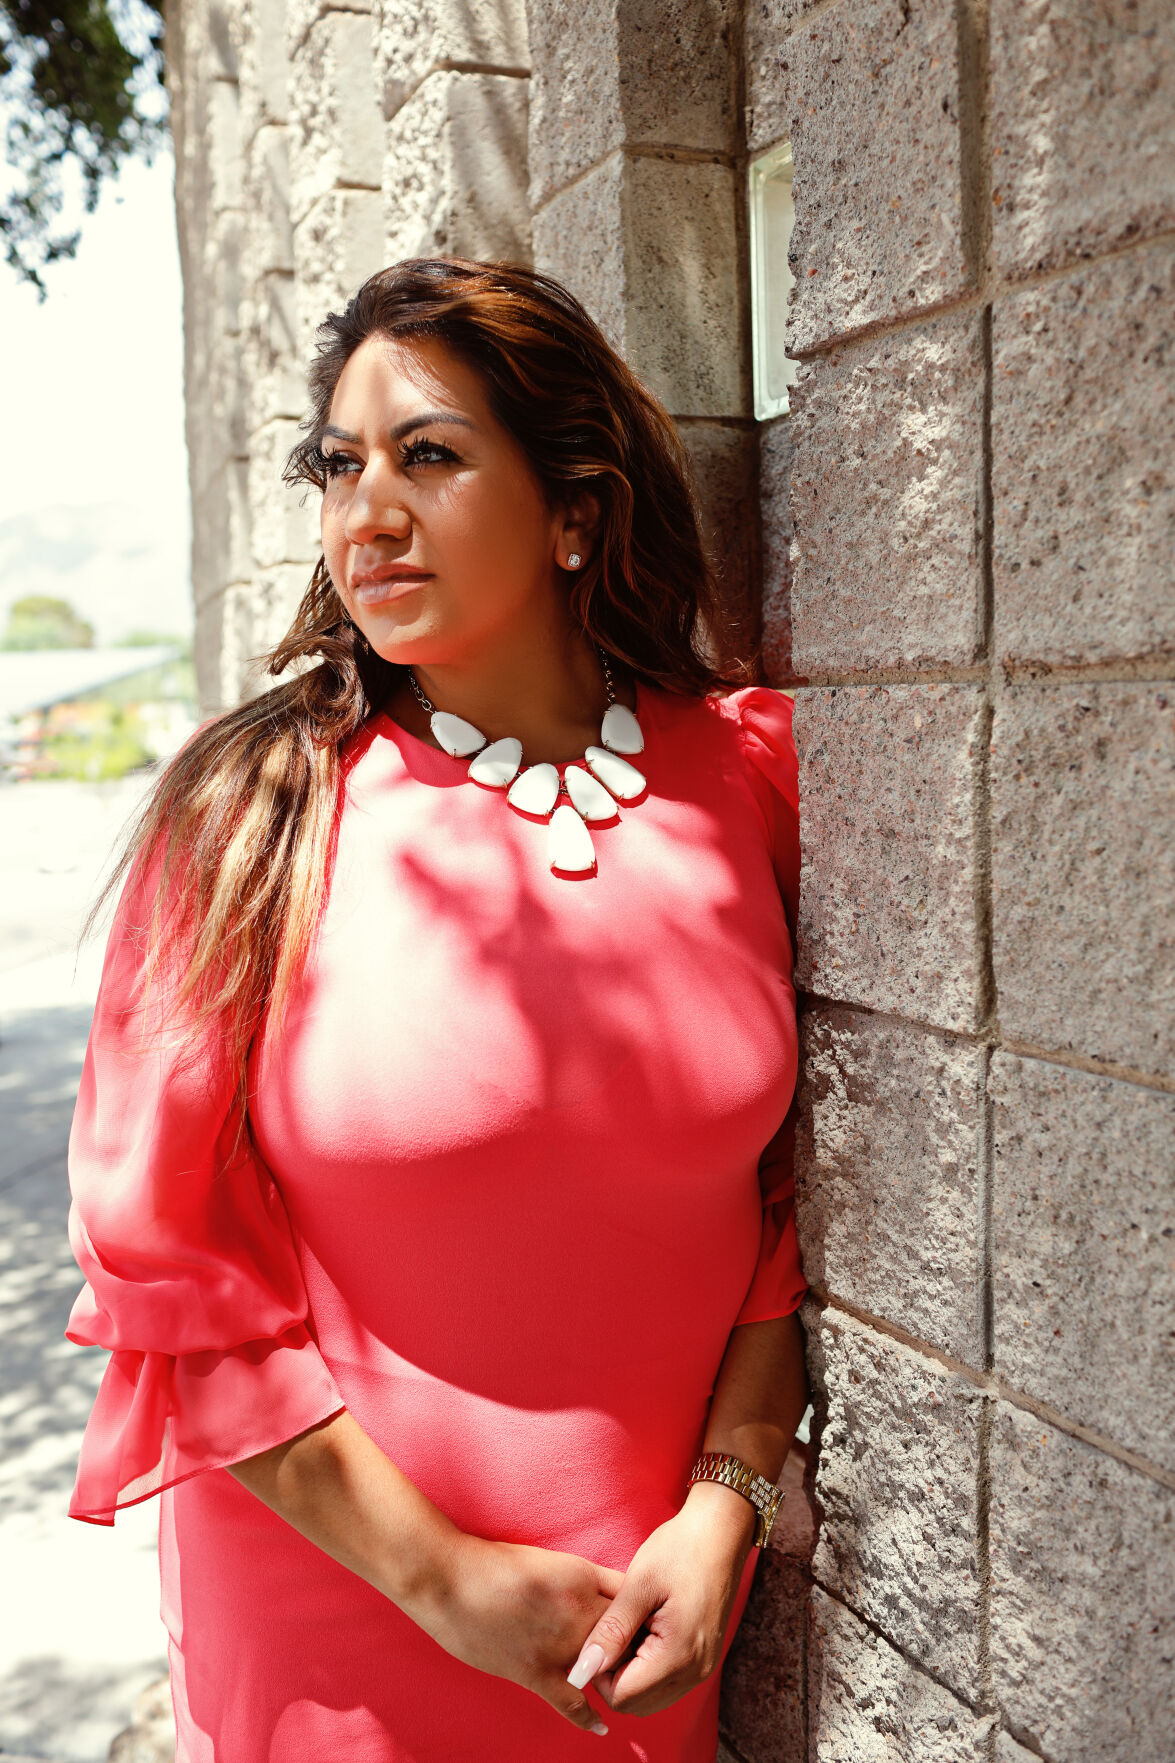 State Rep. Alma Hernandez